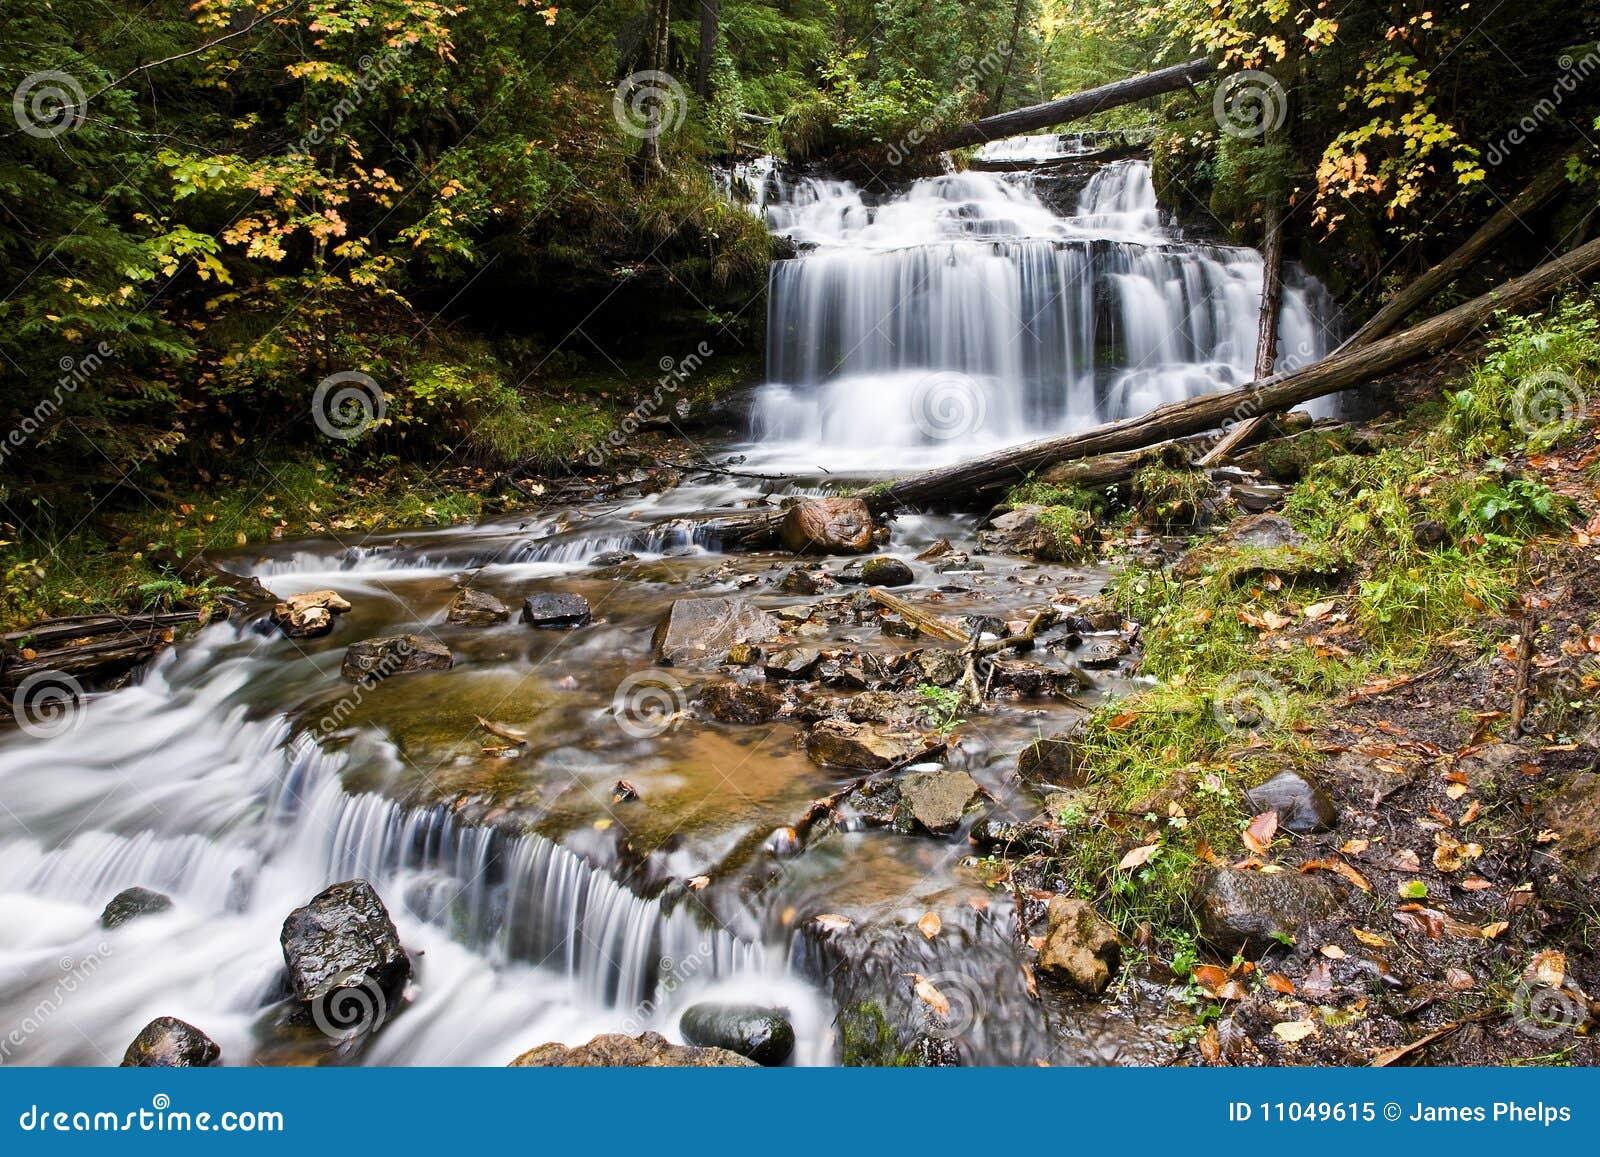 michigan upper peninsula waterfalls - photo #28